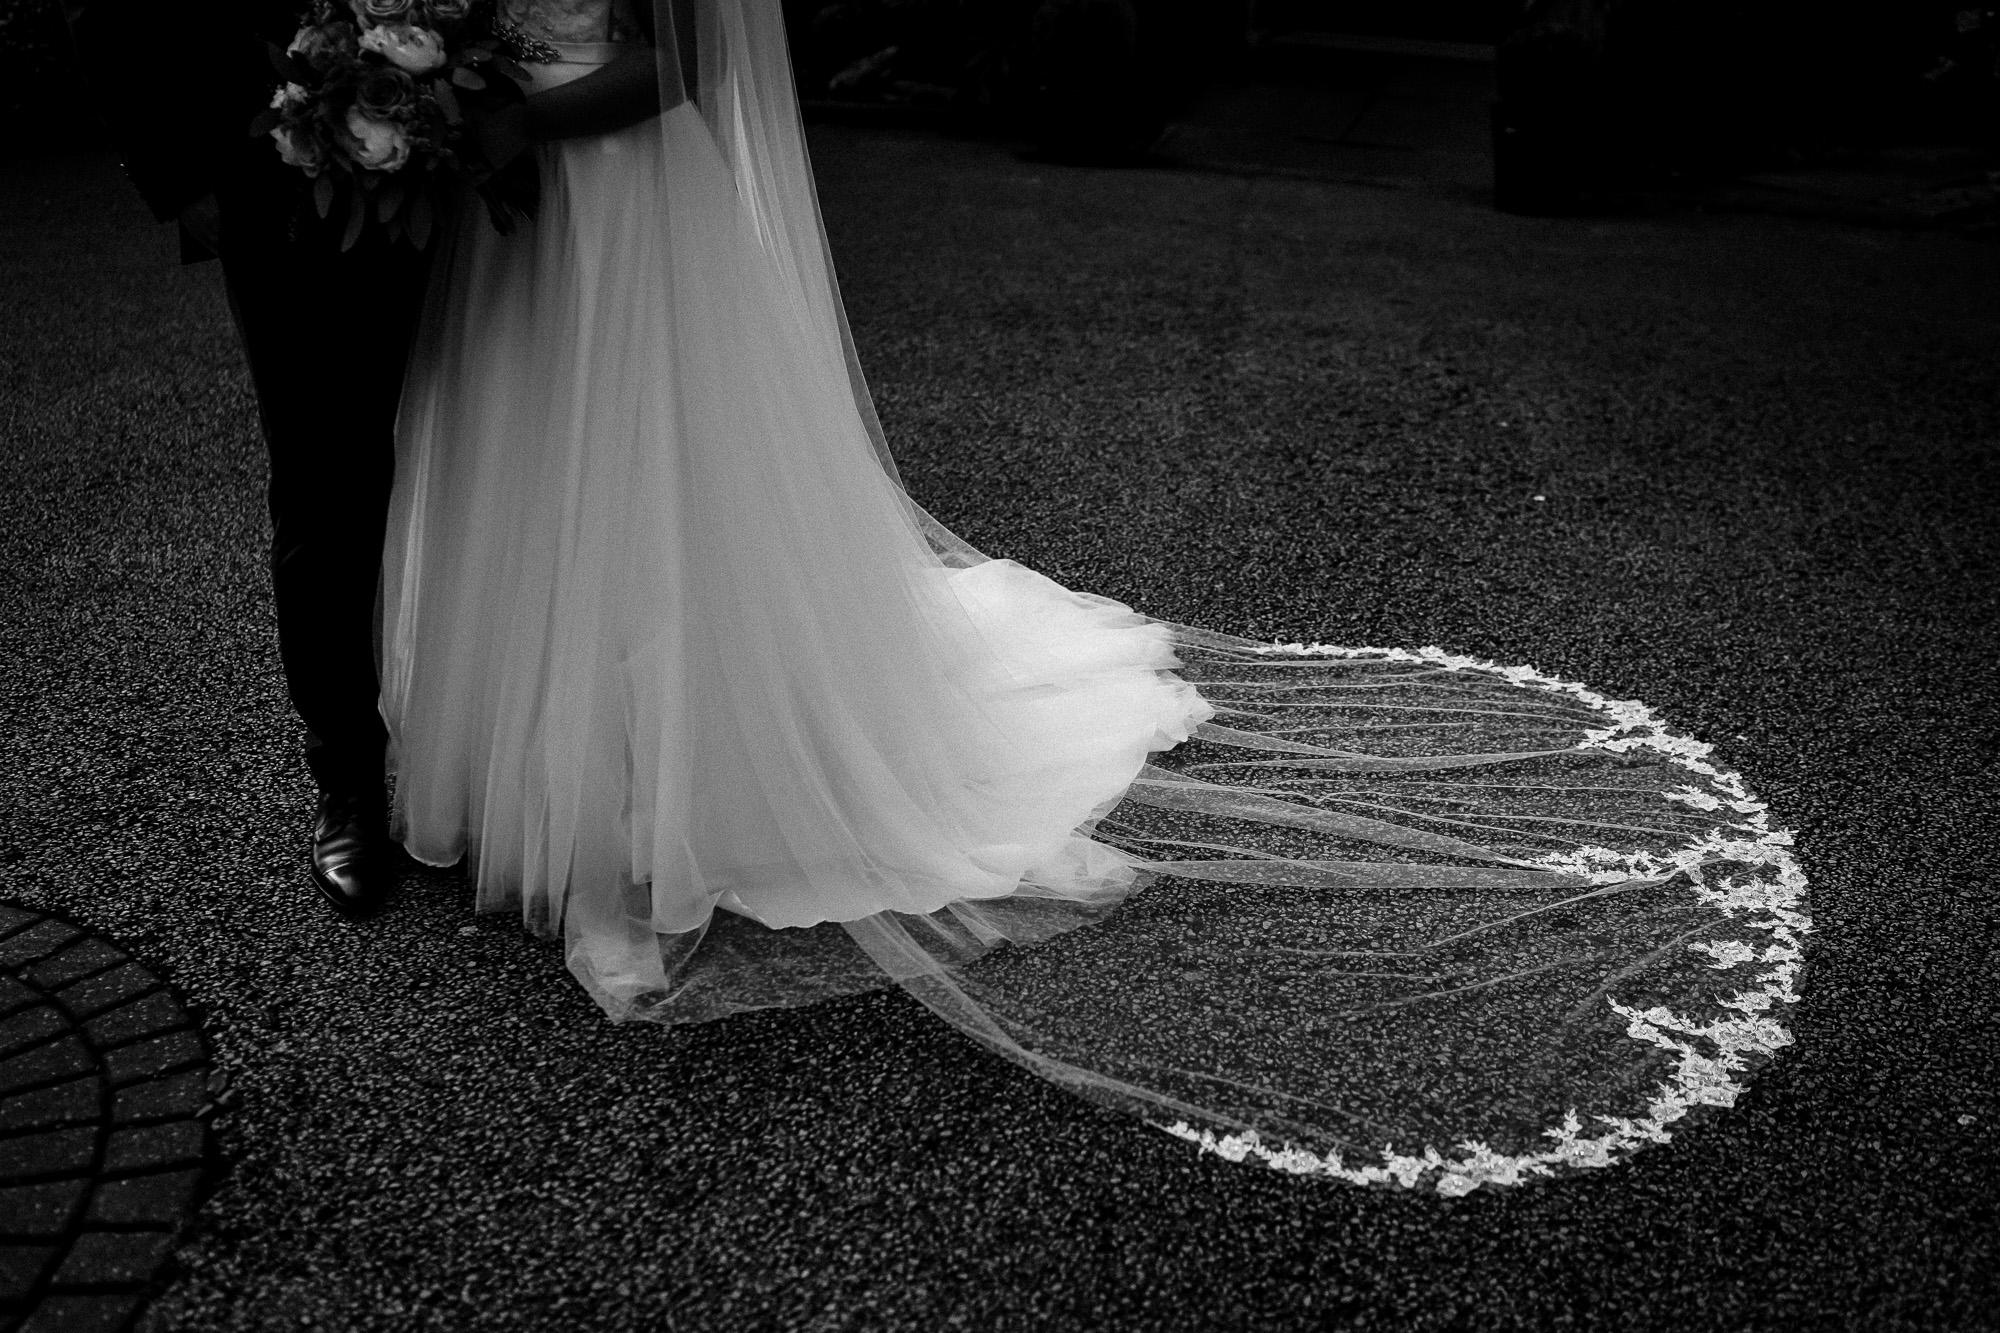 West Tower Wedding Photographer Ormskirk Lancashire wedding photography (37 of 57).jpg